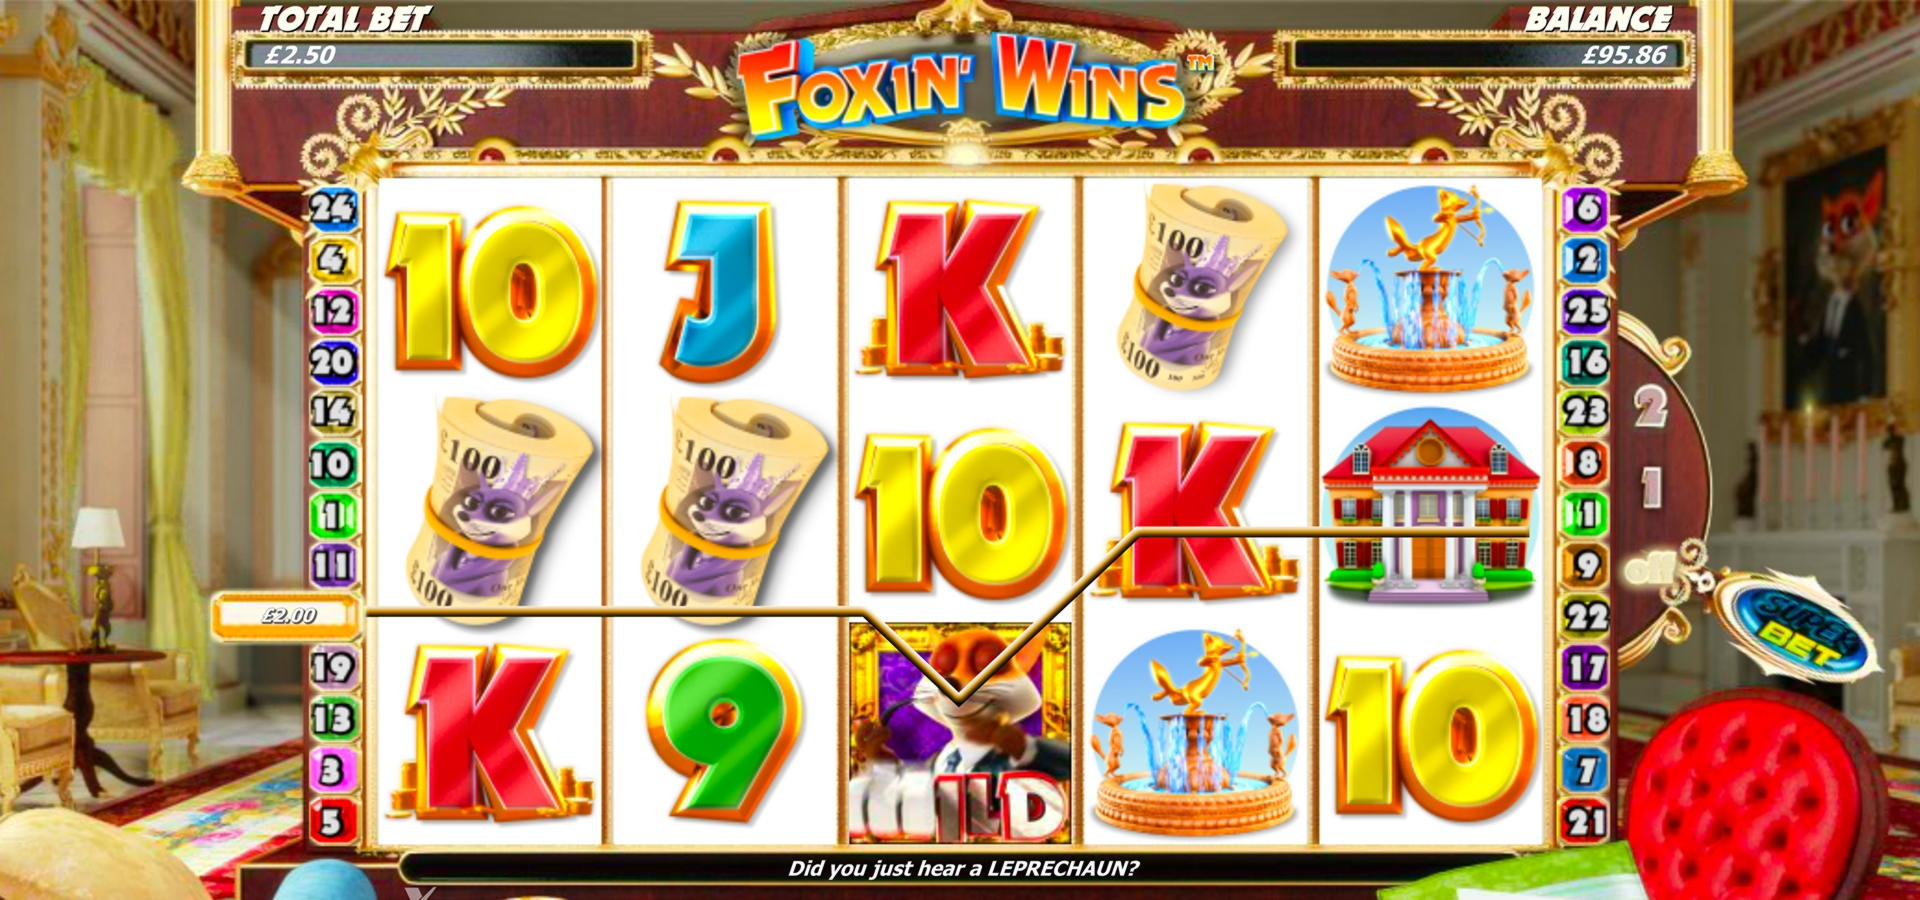 € JN Casino-da 1240 No Depozit Bonus Kodu